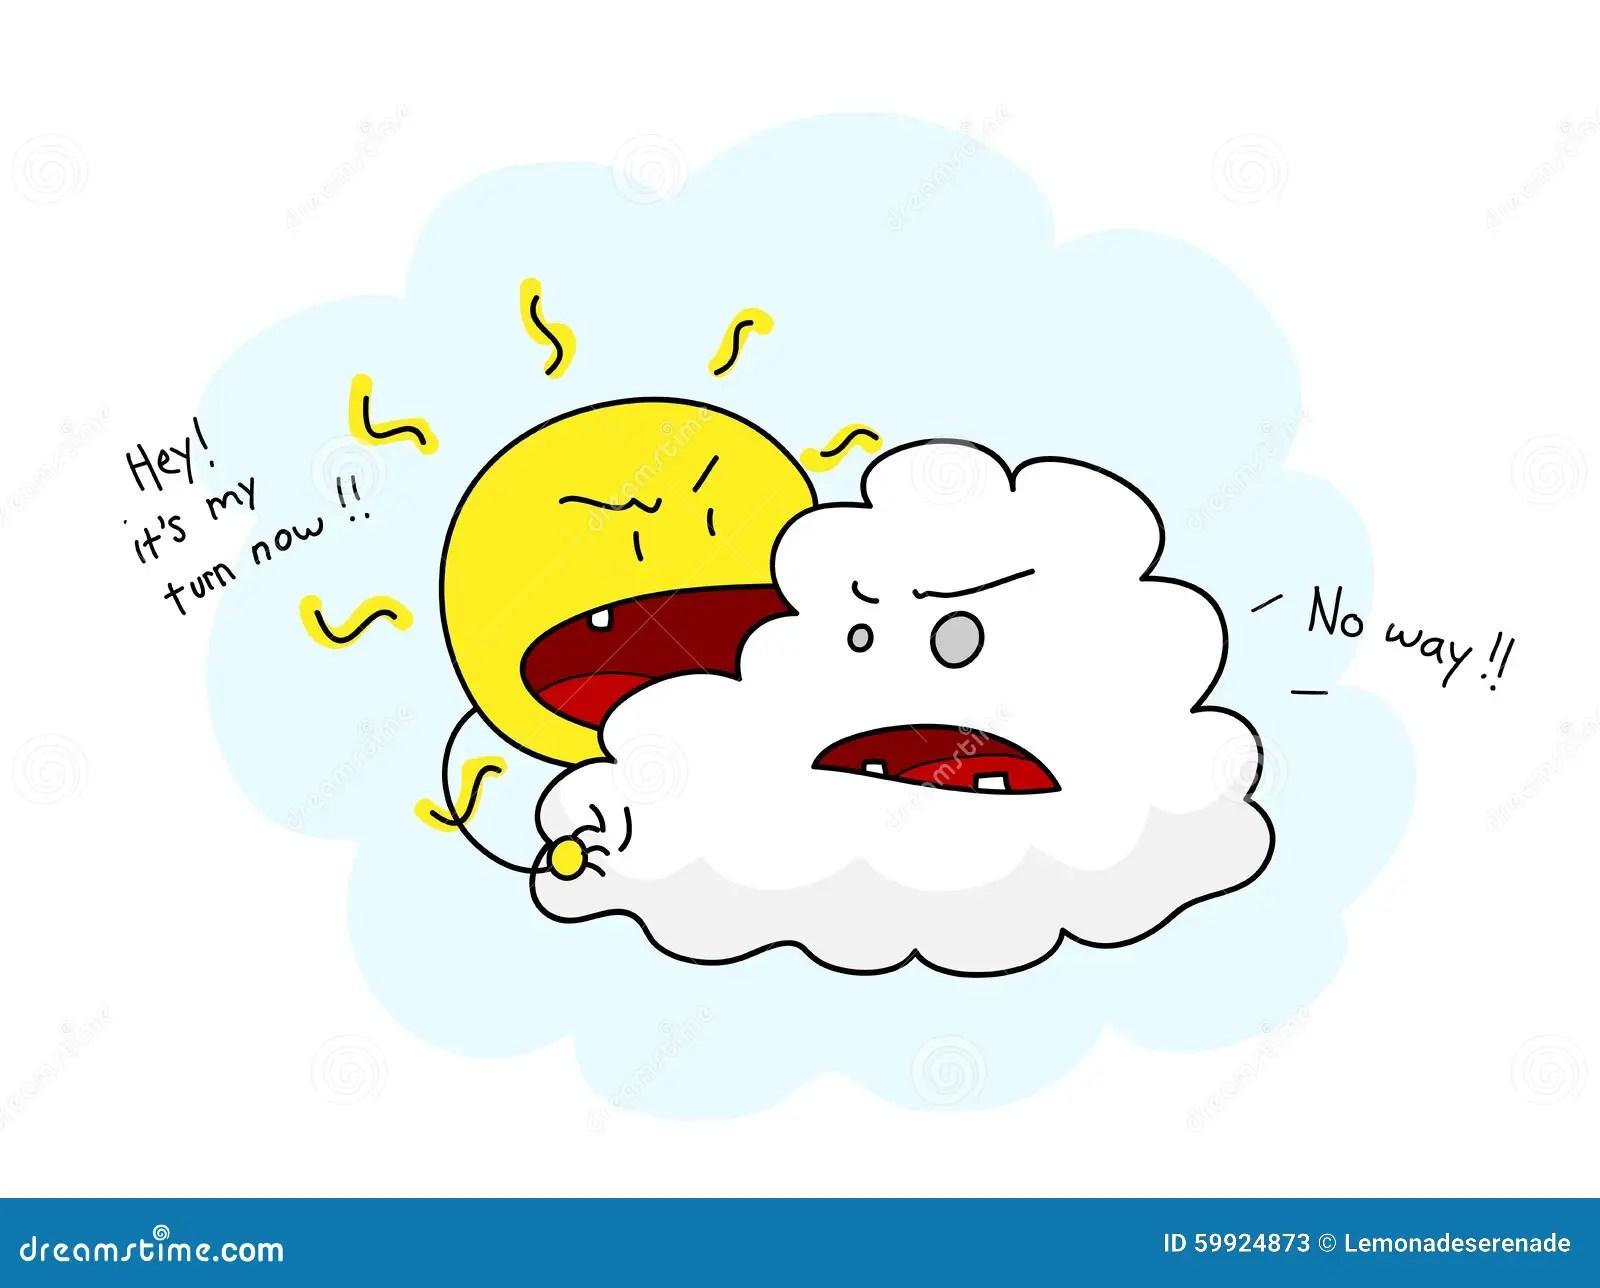 hight resolution of sun cloud fighting cartoon stock illustrations 2 sun cloud fighting cartoon stock illustrations vectors clipart dreamstime